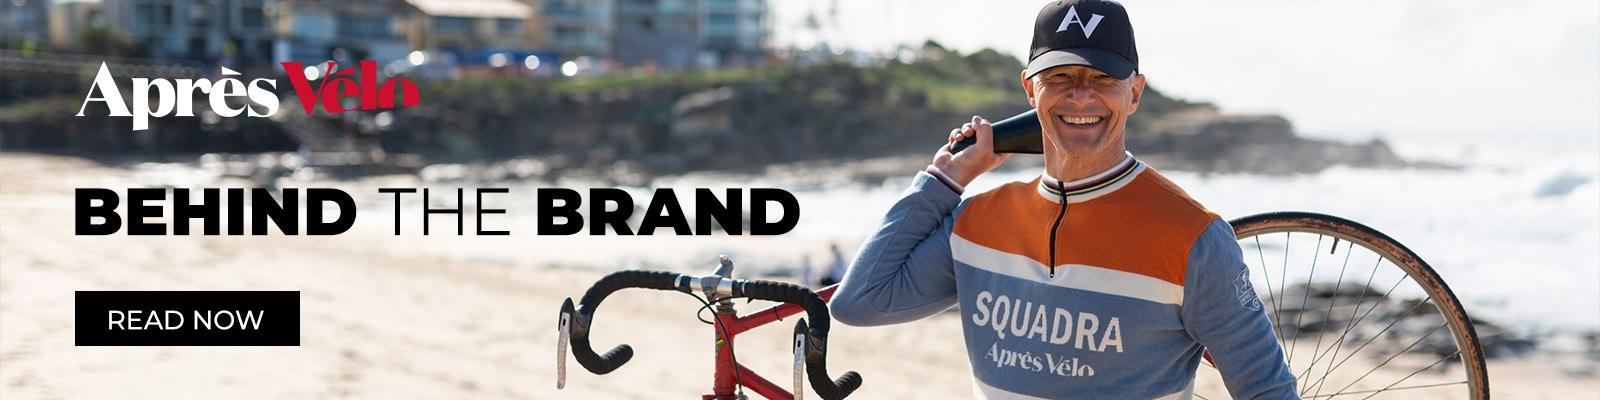 Apres-Velo: Behind the Brand